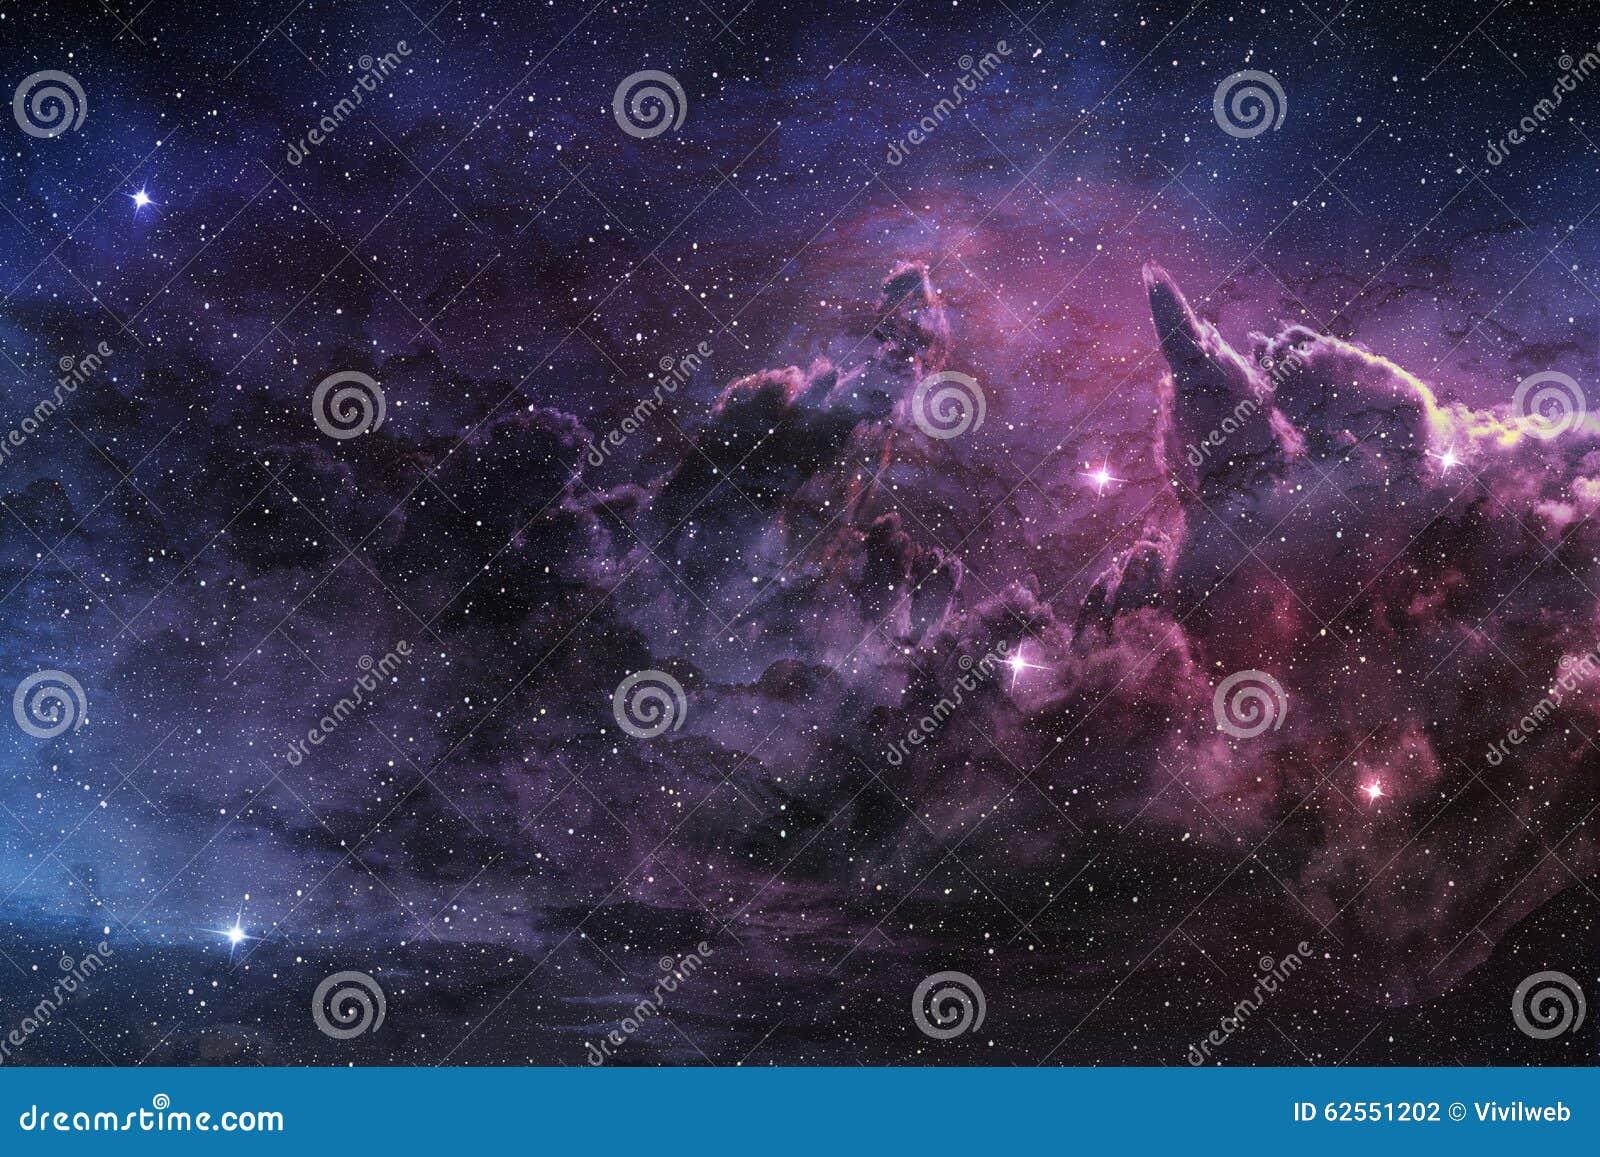 nebula space dust star - photo #1